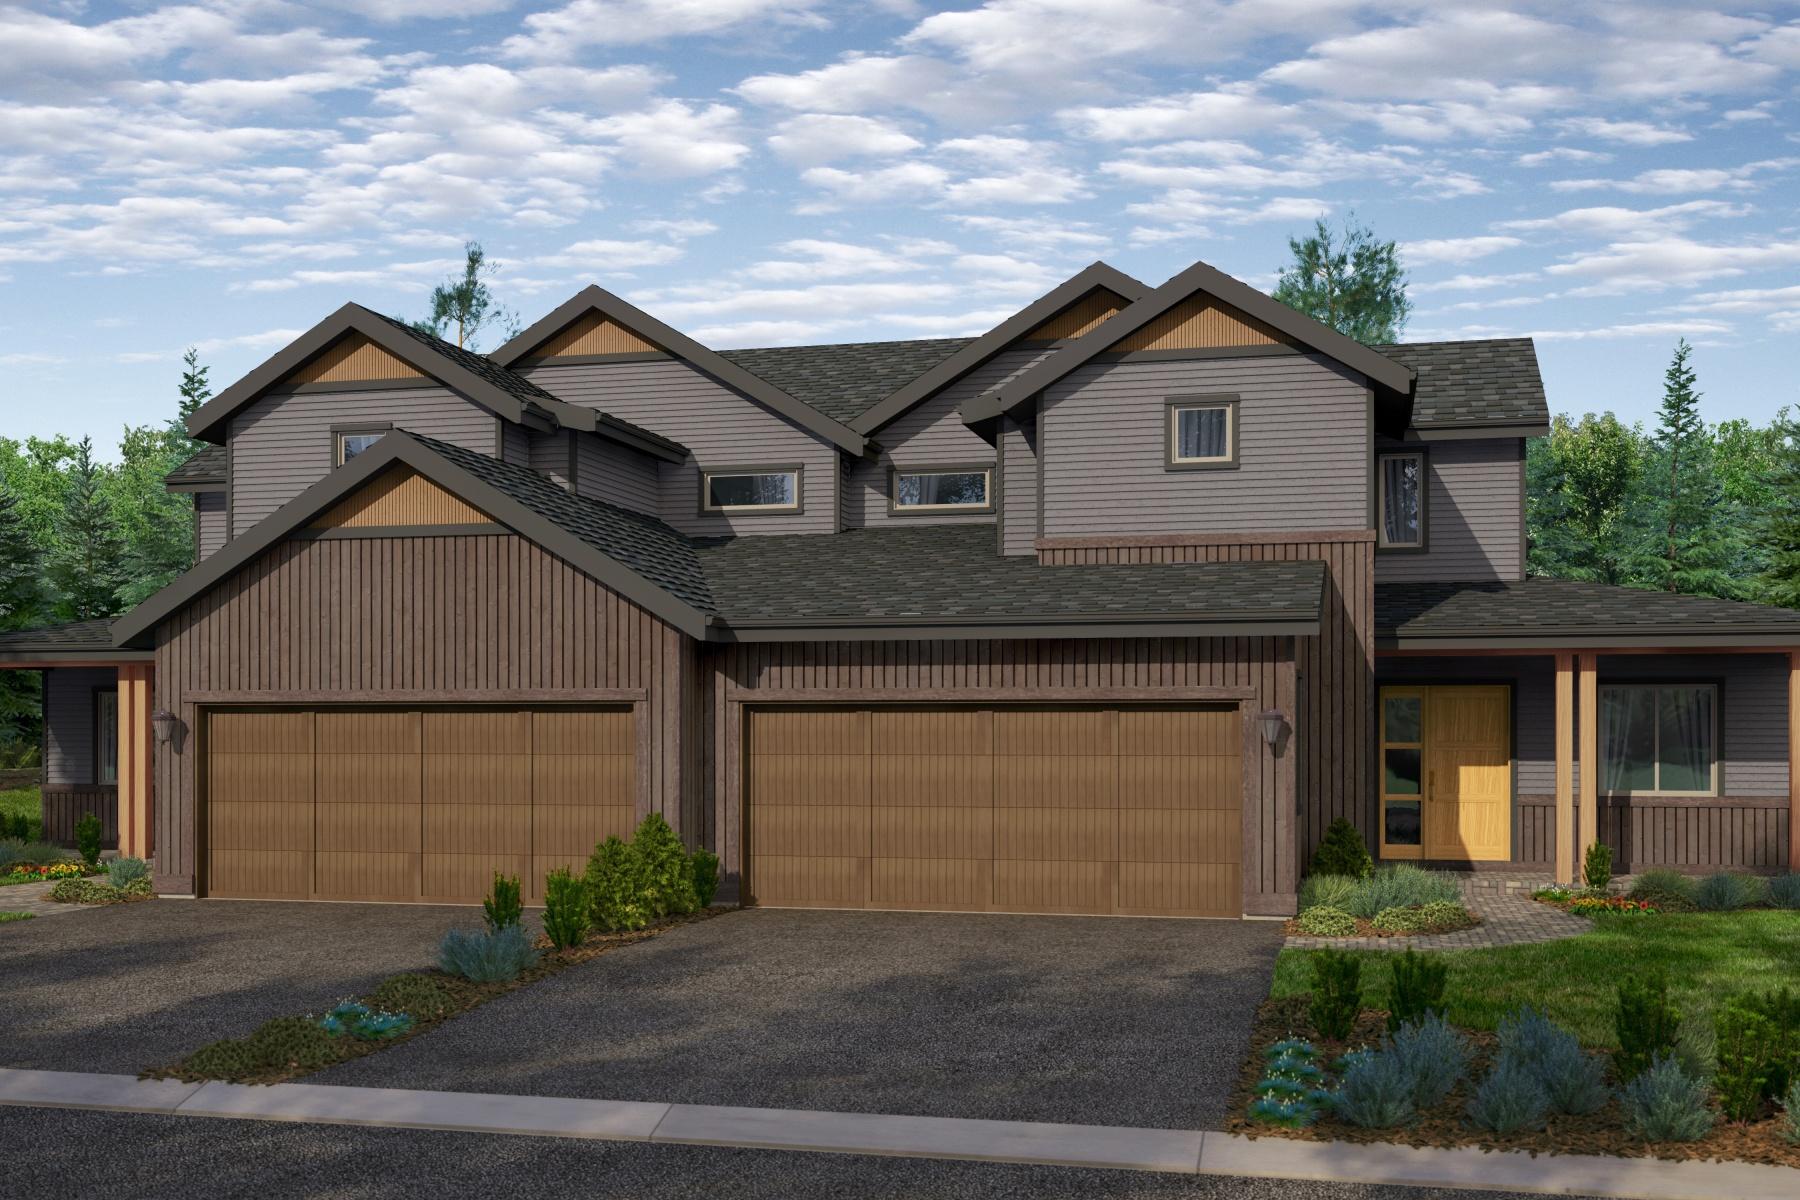 Single Family Home for Sale at 60499 Kangaroo, Bend 60499 Kangaroo Loop Lot 24, Bend, Oregon, 97702 United States